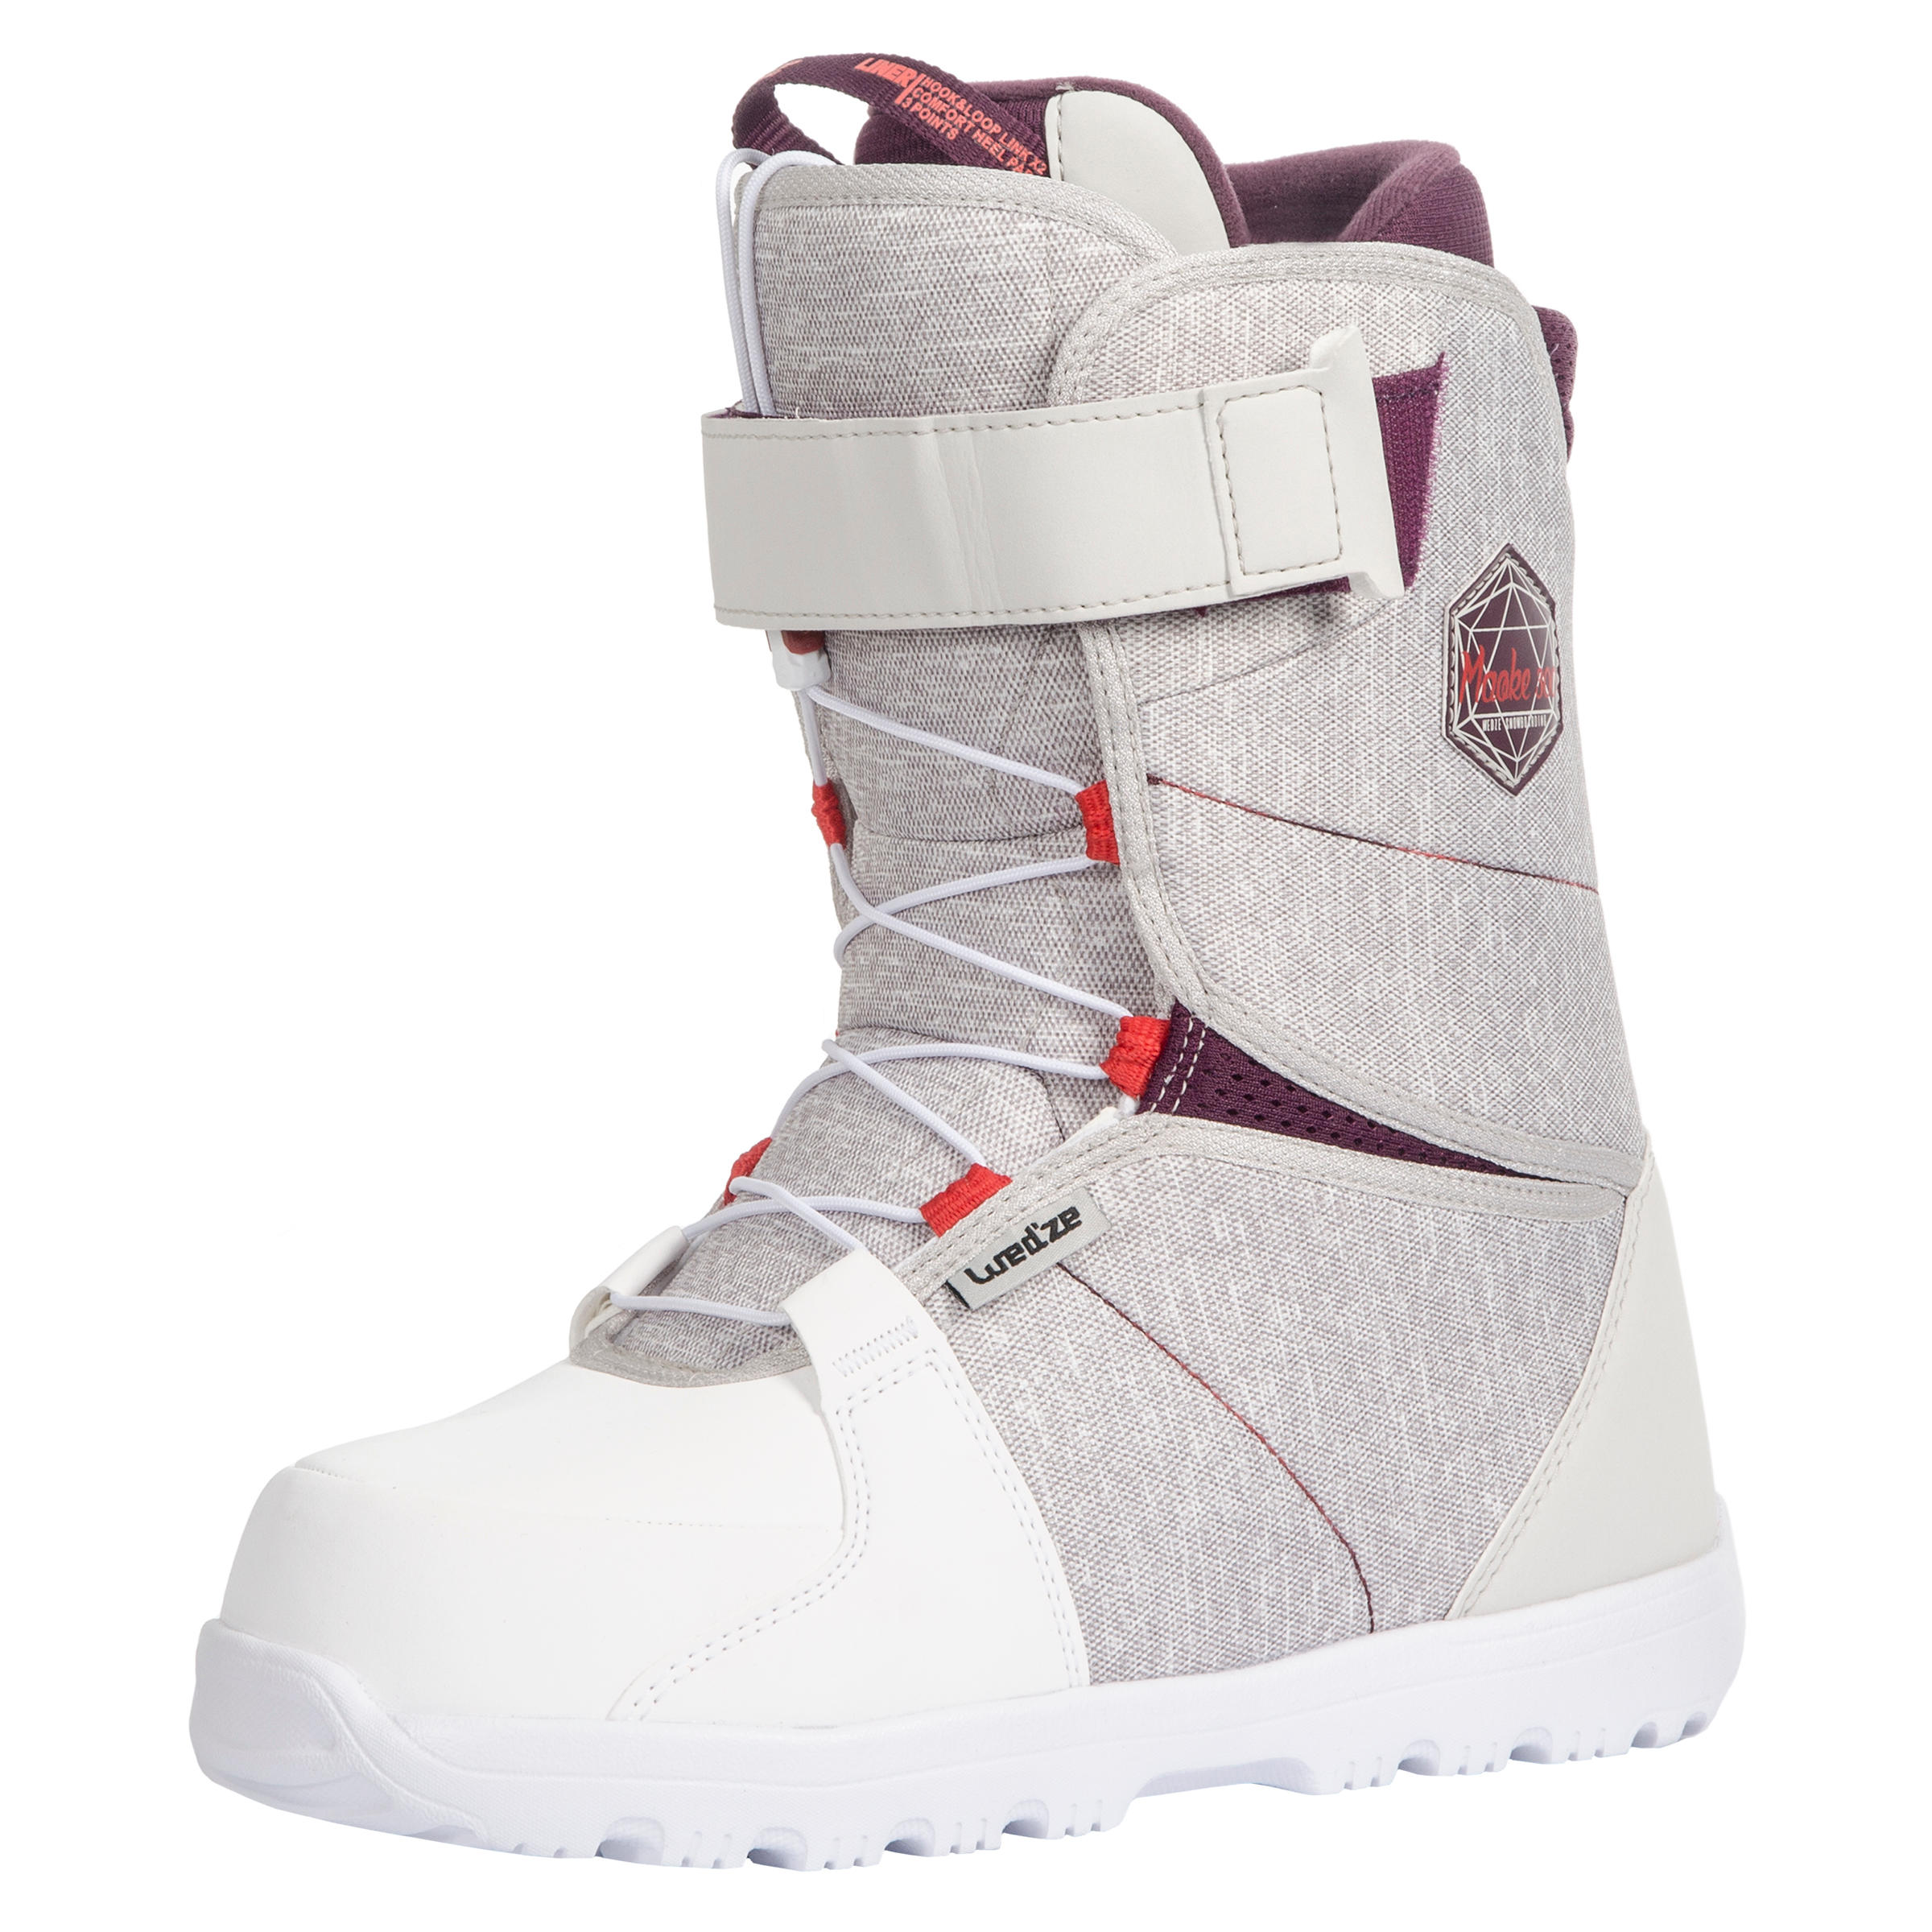 Boots snowboard Maoke 300 Damă imagine